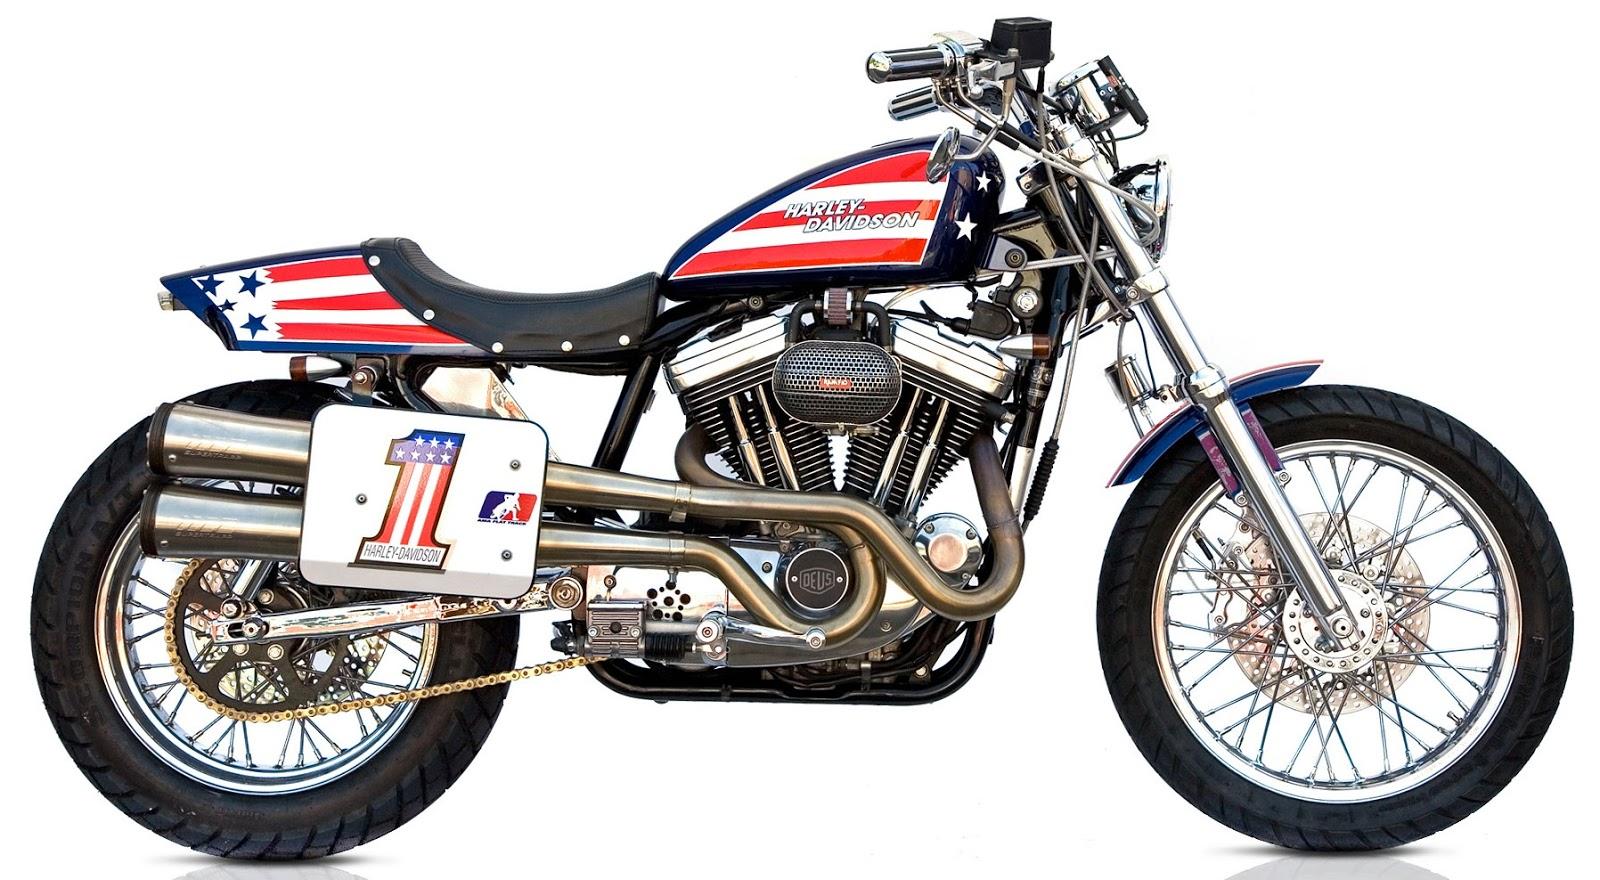 Evel Knievel 1200: The Legend Of Harley Davidson Sportster: Evel Knievel: L